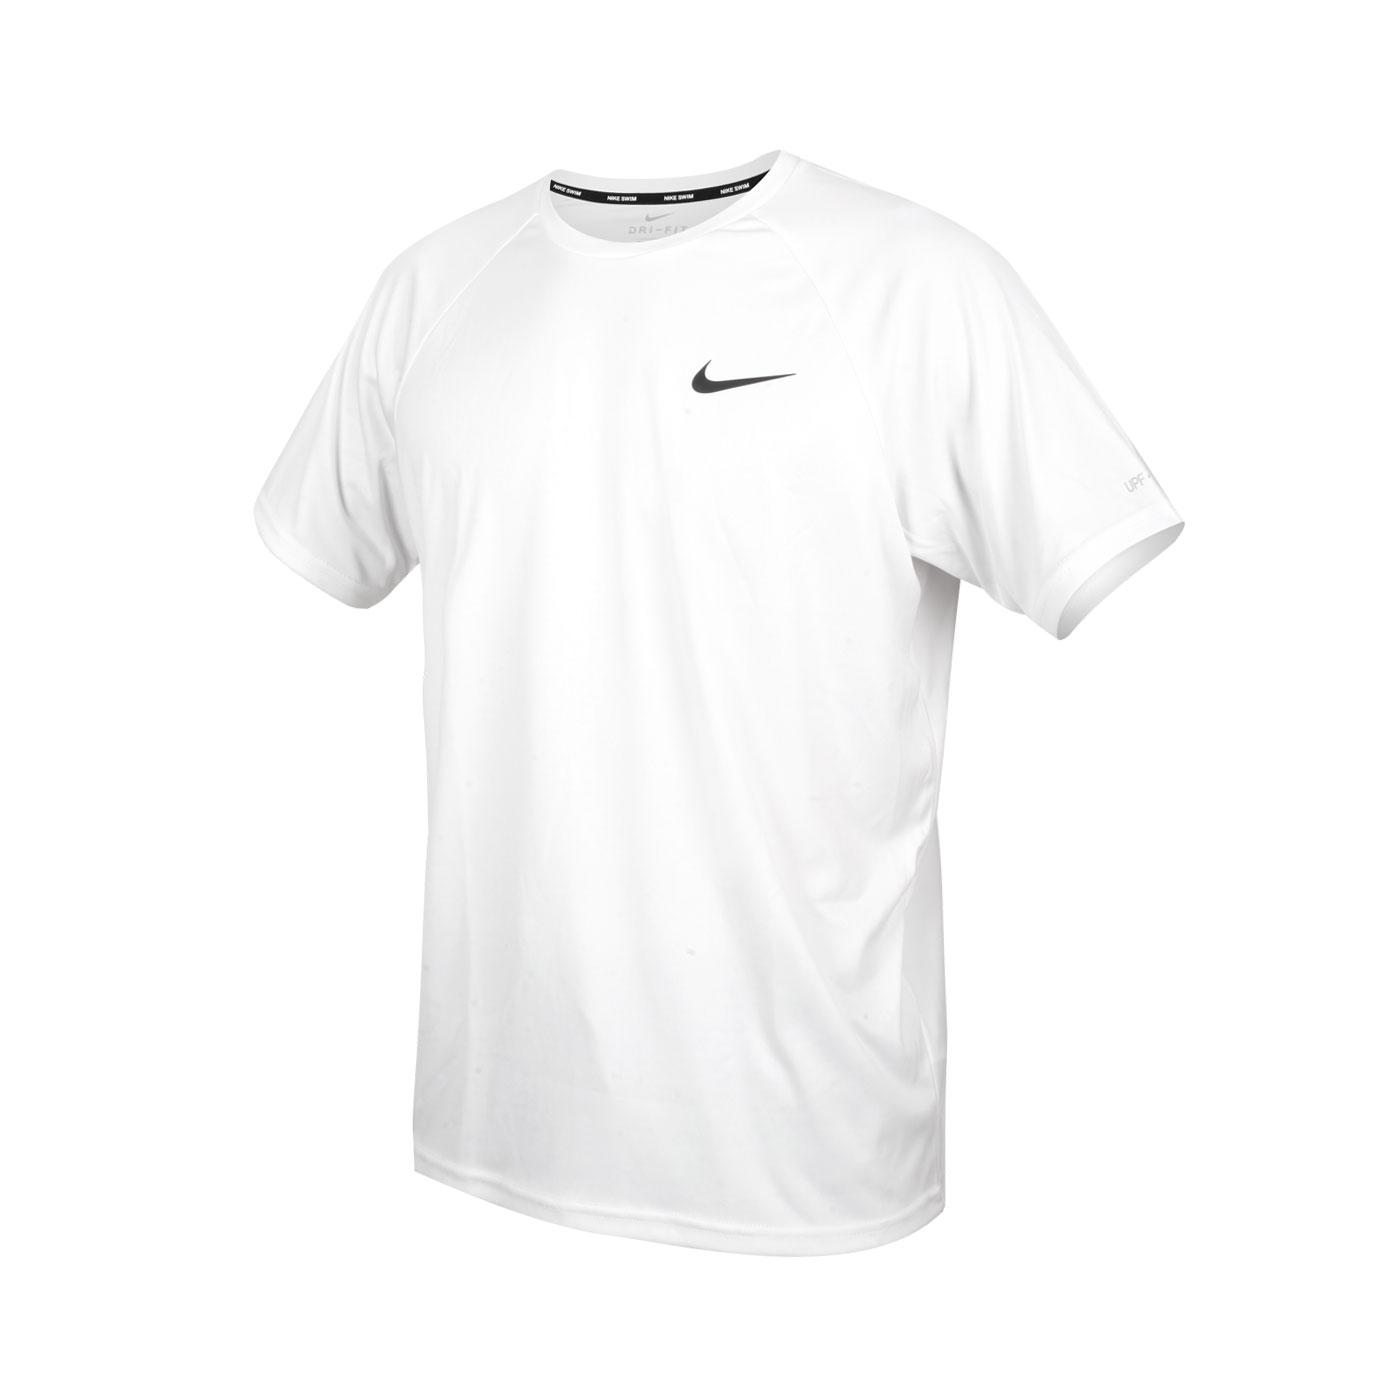 NIKE SWIM 男款短袖防曬T恤 NESSA586-100 - 白黑